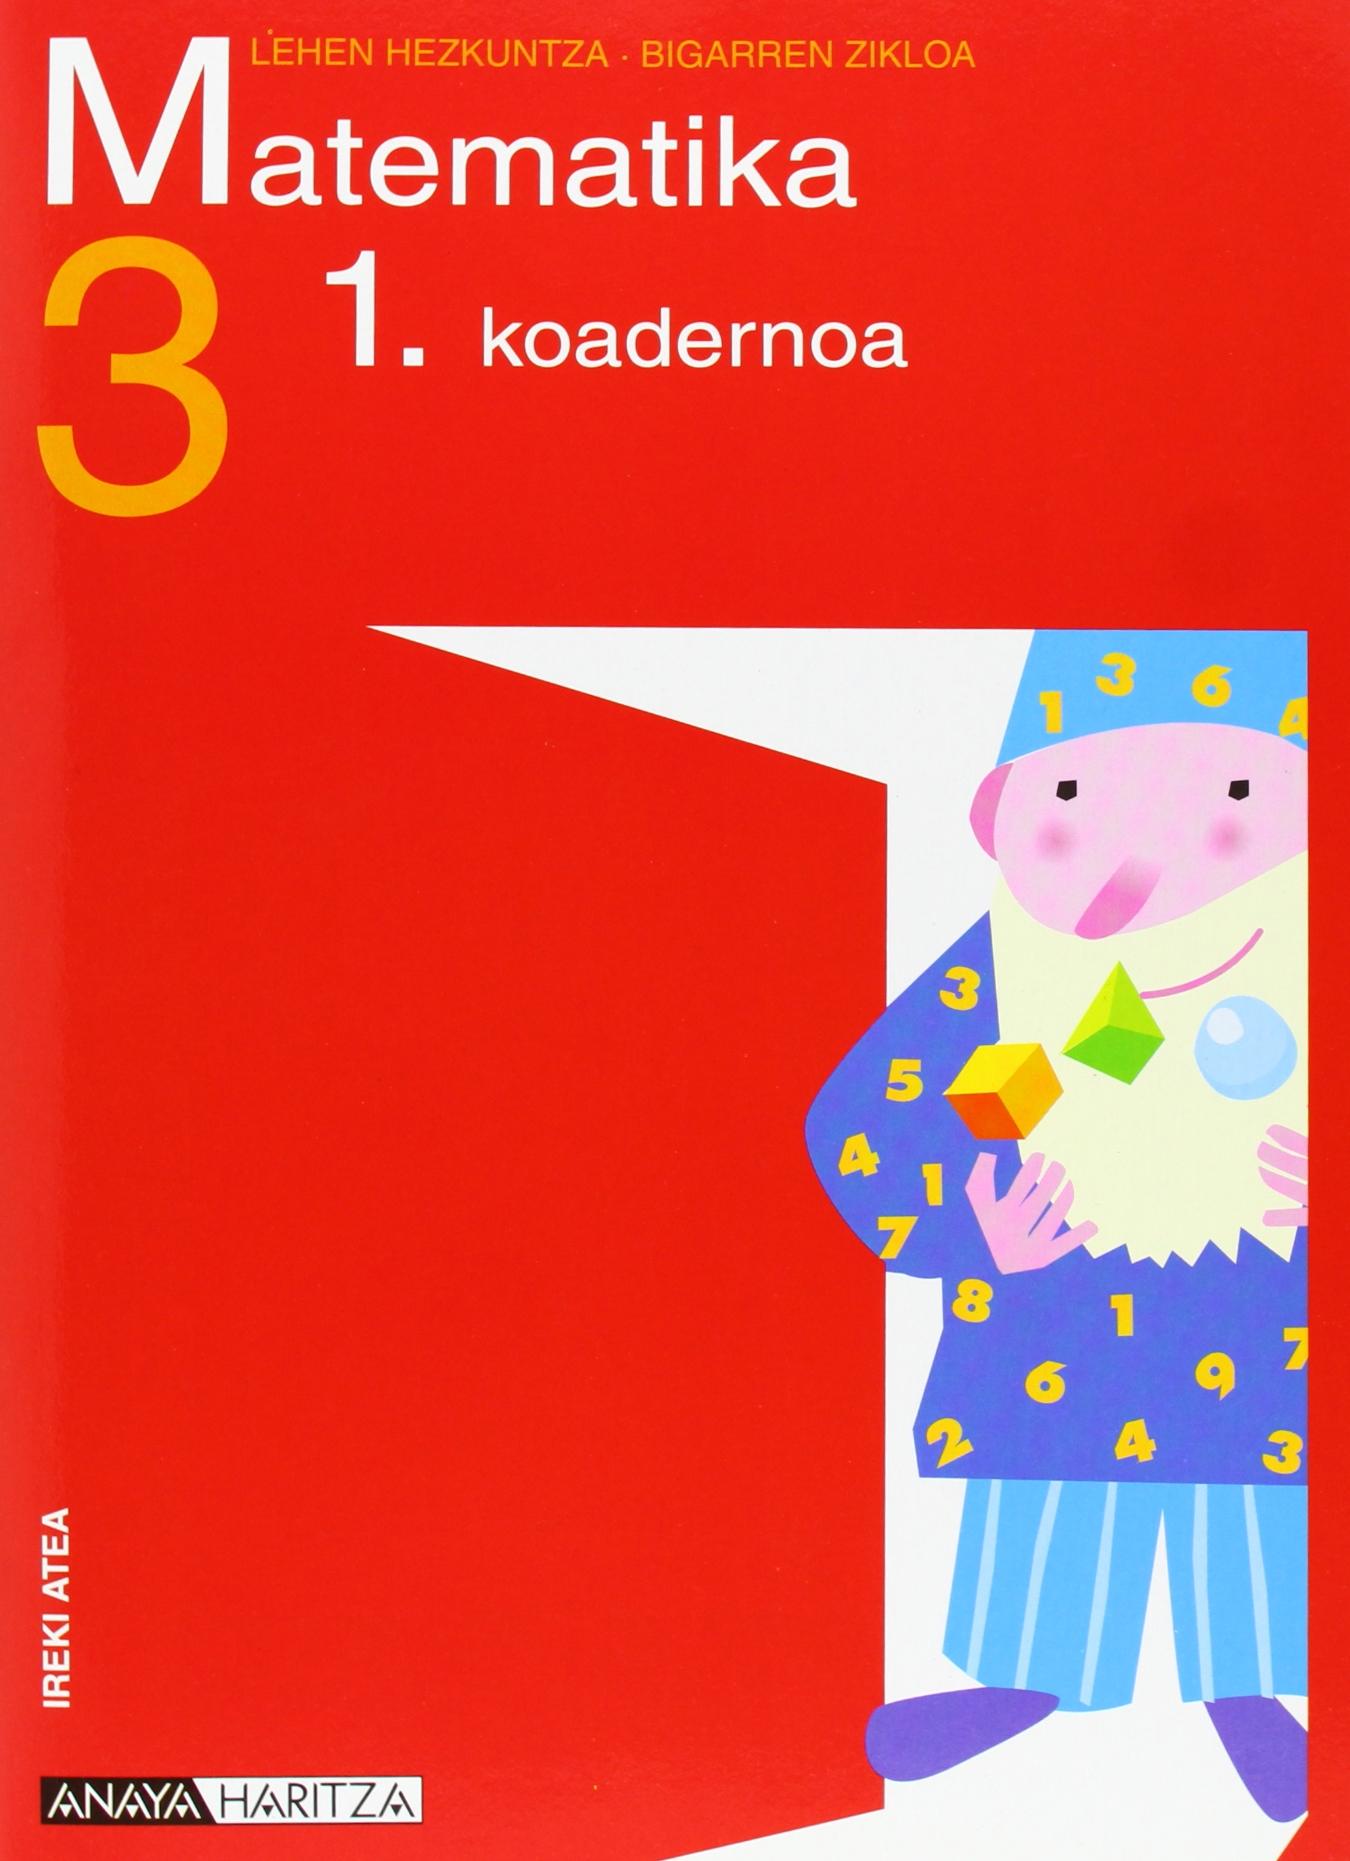 Matematika 3. 1 koadernoa. (Ireki Atea) (Euskera) Tapa blanda – 26 may 2008 Luis Ferrero de Pablo ANAYA EDUCACIÓN 8466769331 YQ